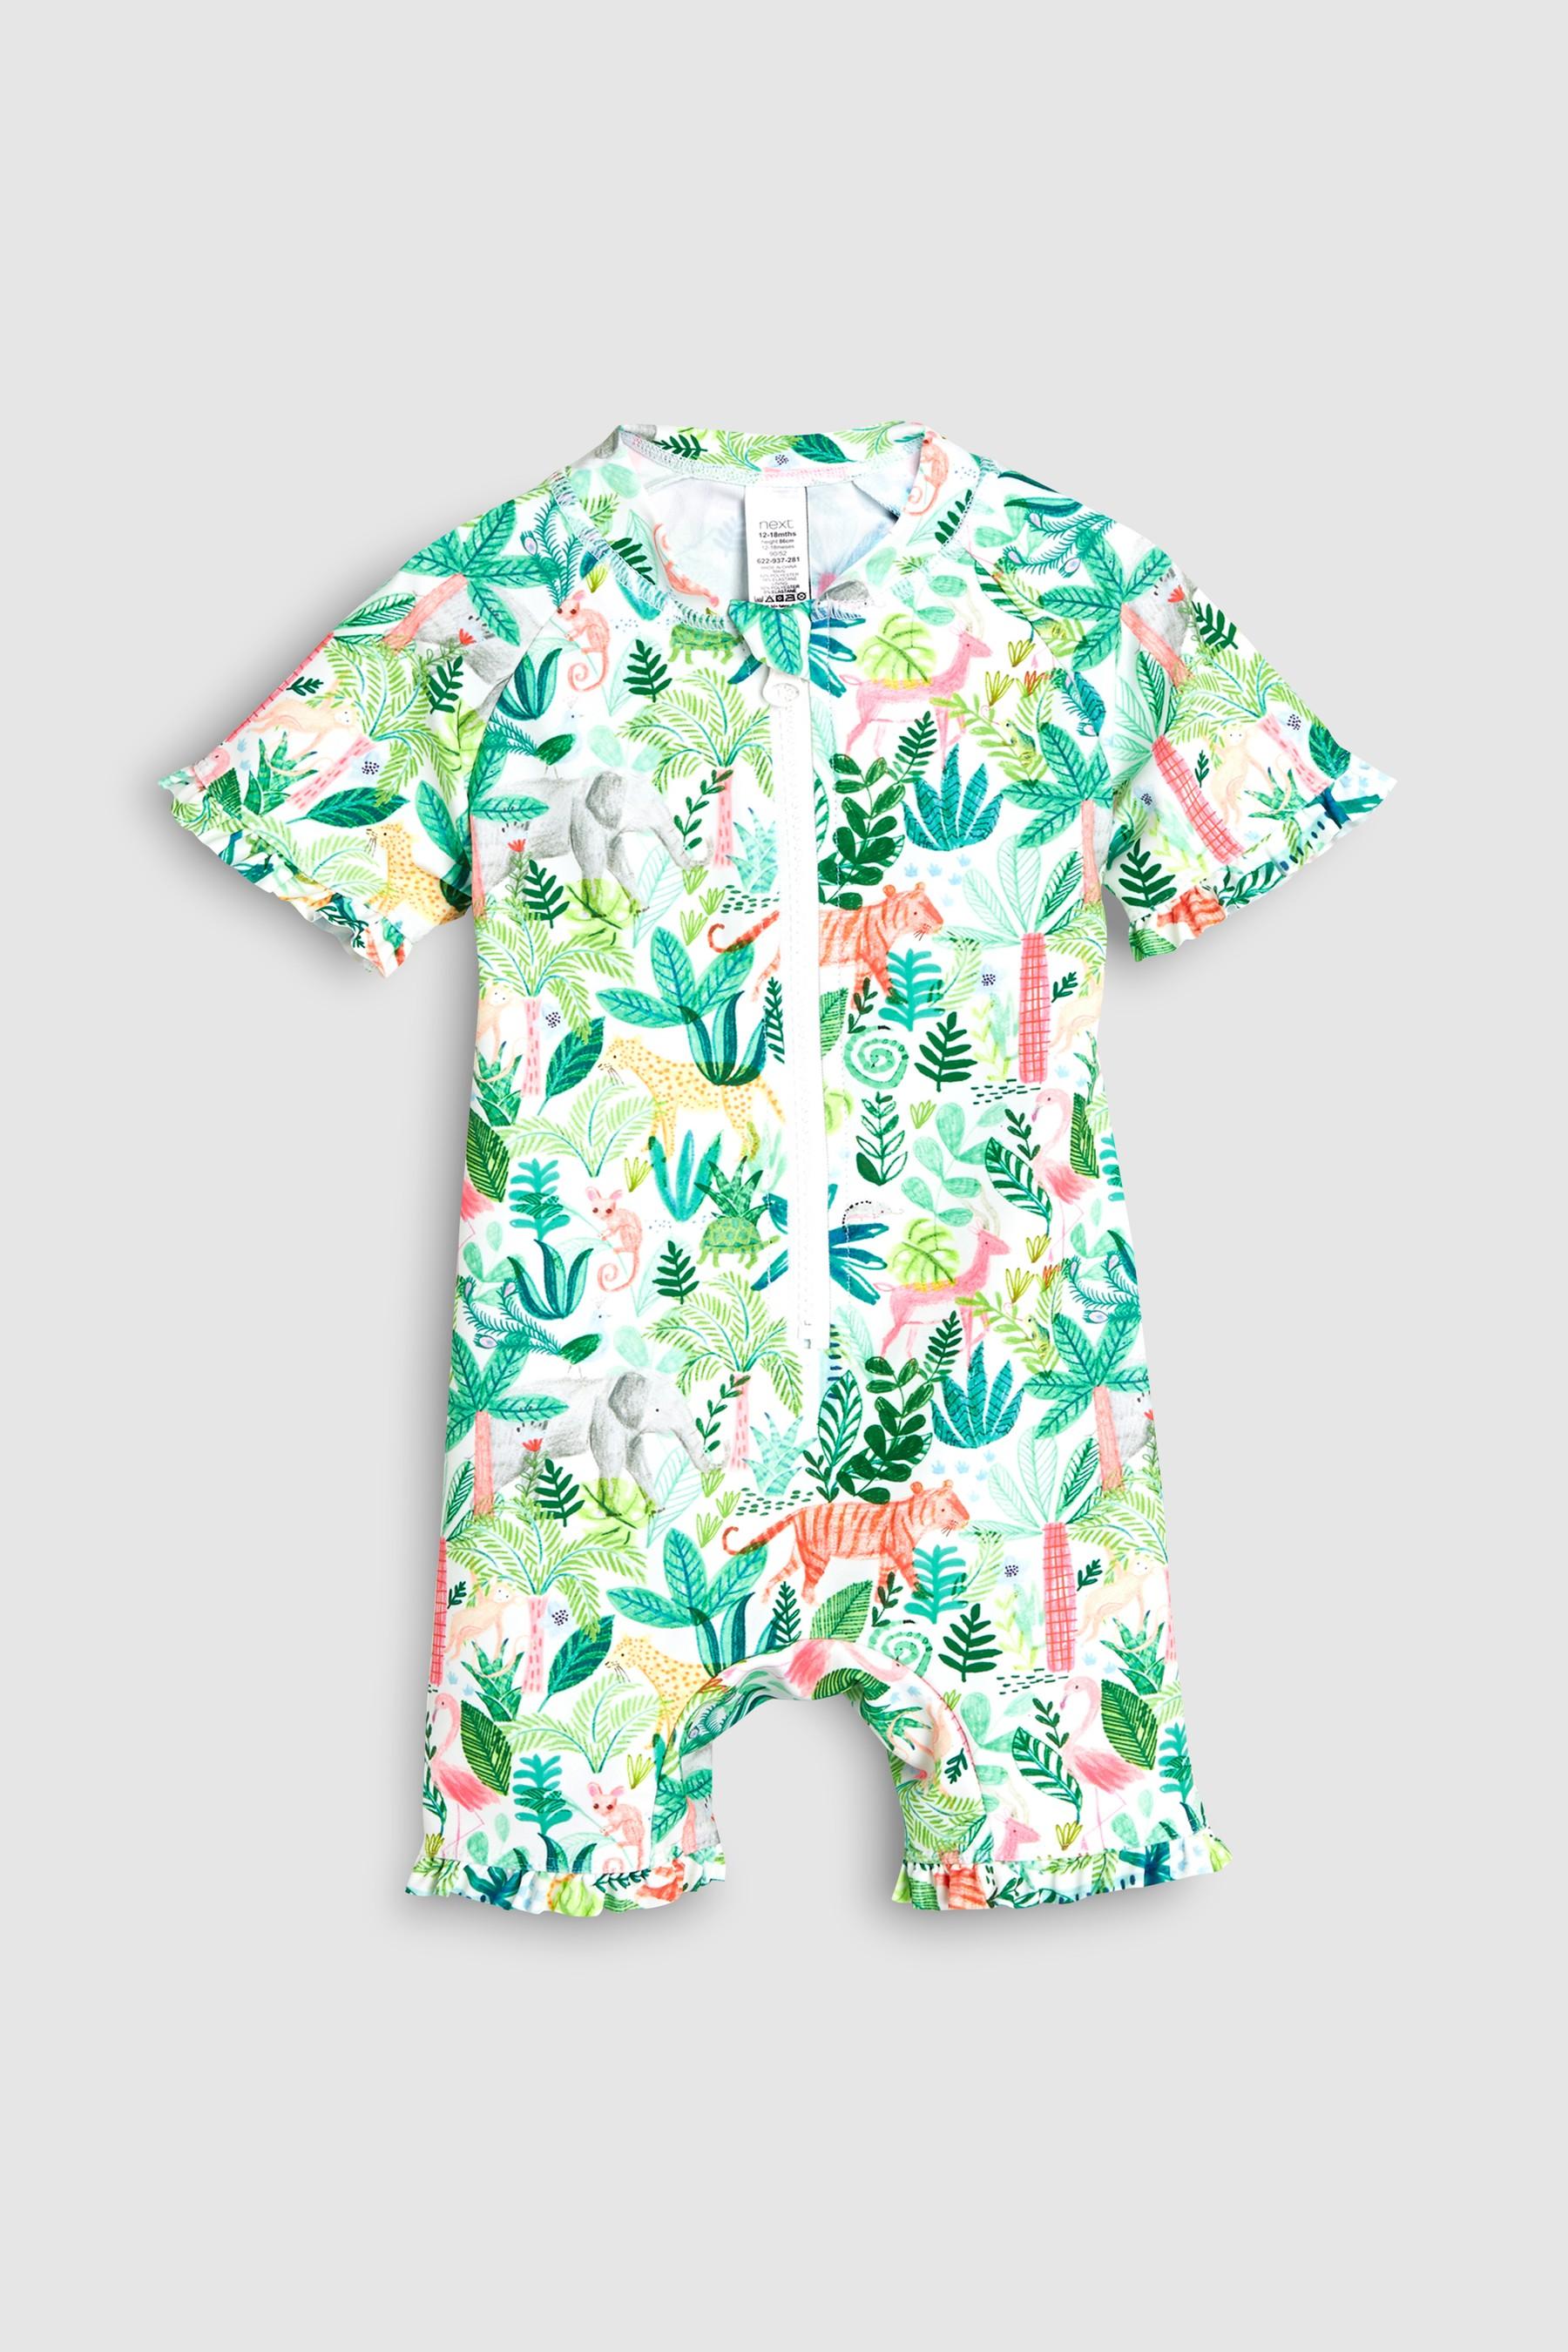 861fbb59d3ef0 Girls Next Jungle Print Sunsafe Suit (3mths-7yrs) - Green in 2019 ...